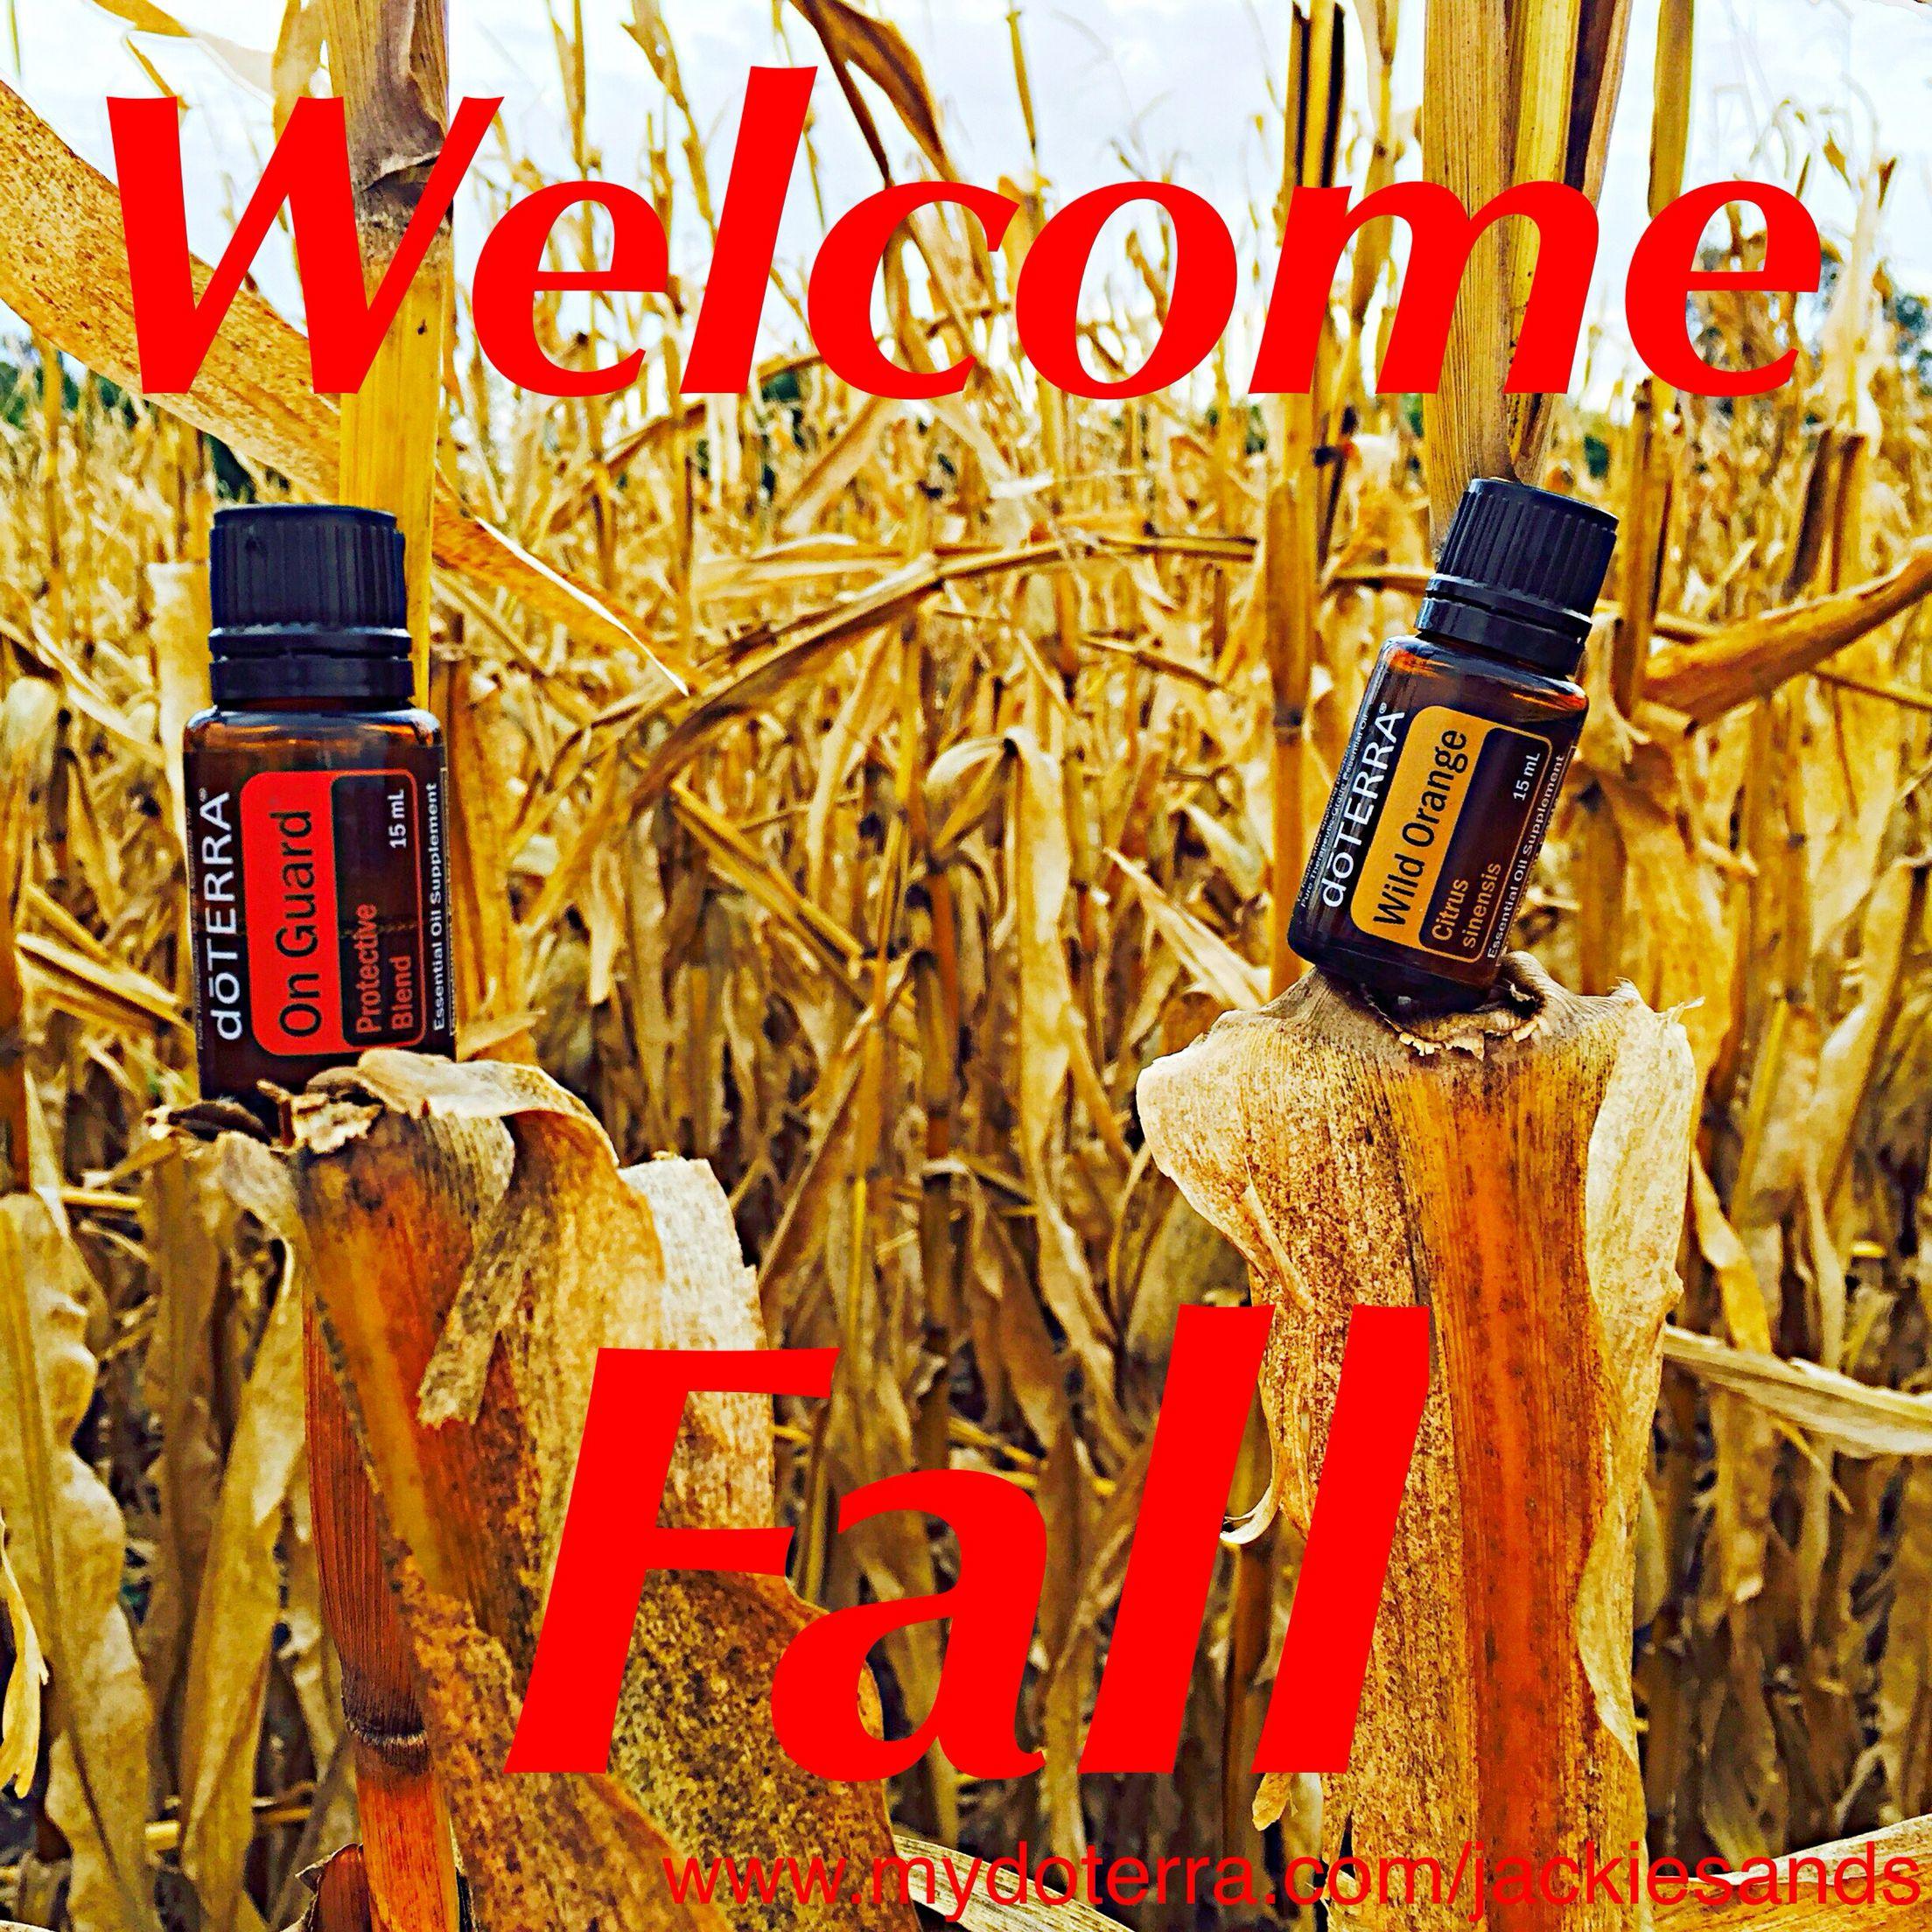 #welcomefall!